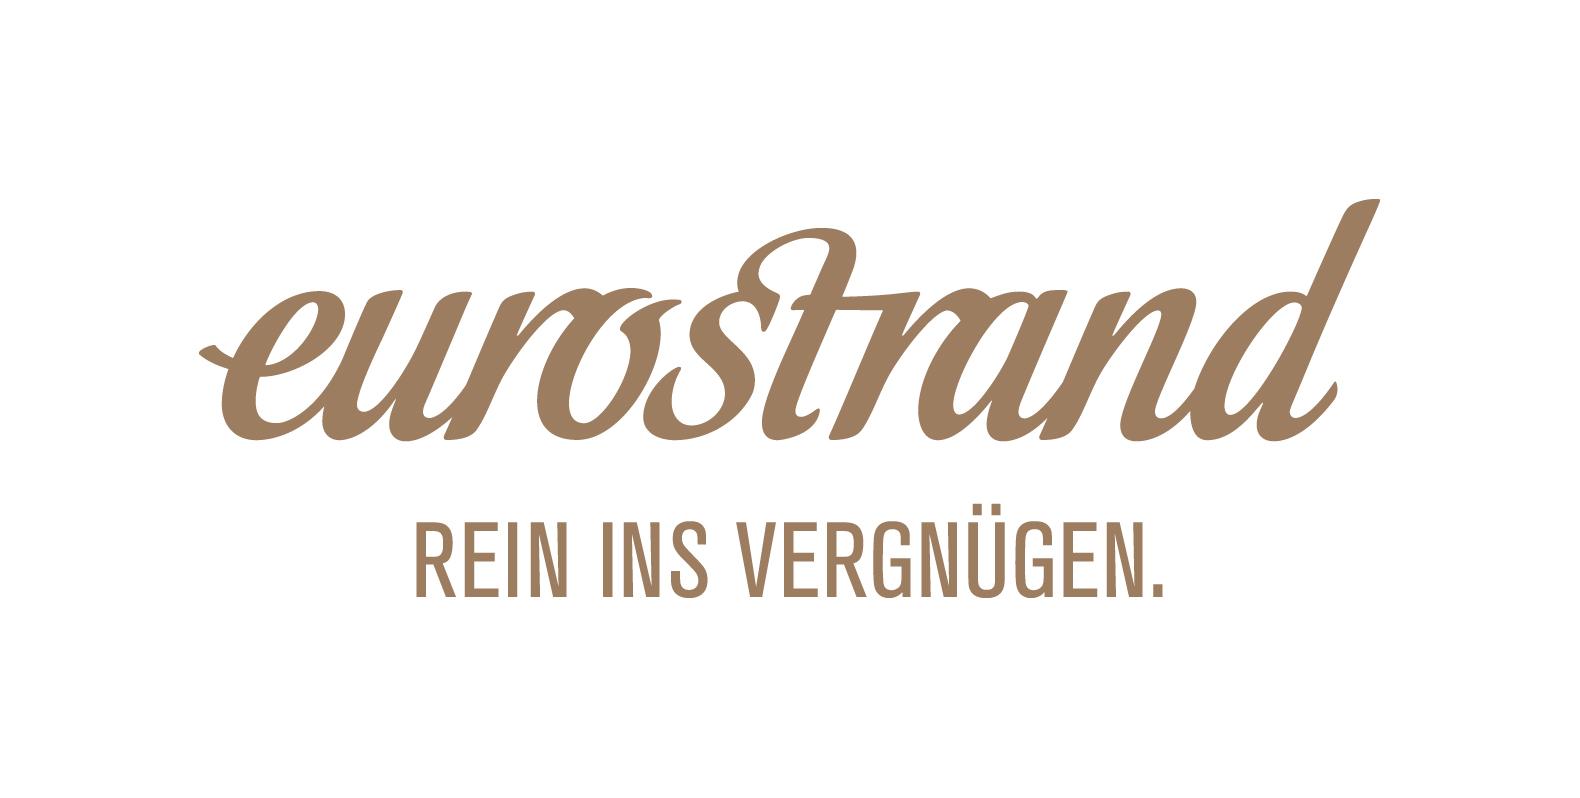 Erlebnisland Eurostrand GmbH & Co. KG